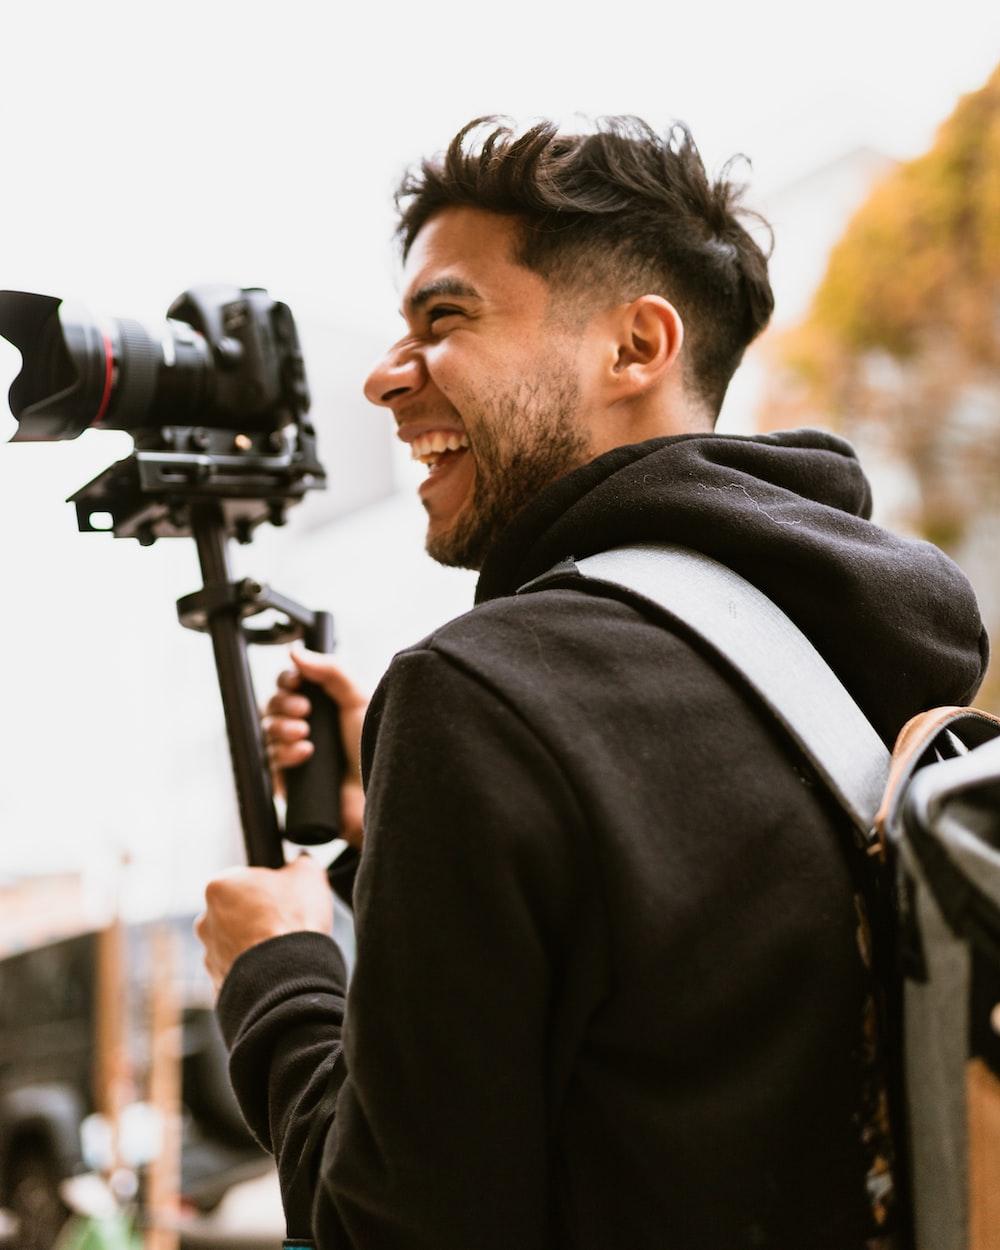 man smiling while holding DSLR camera